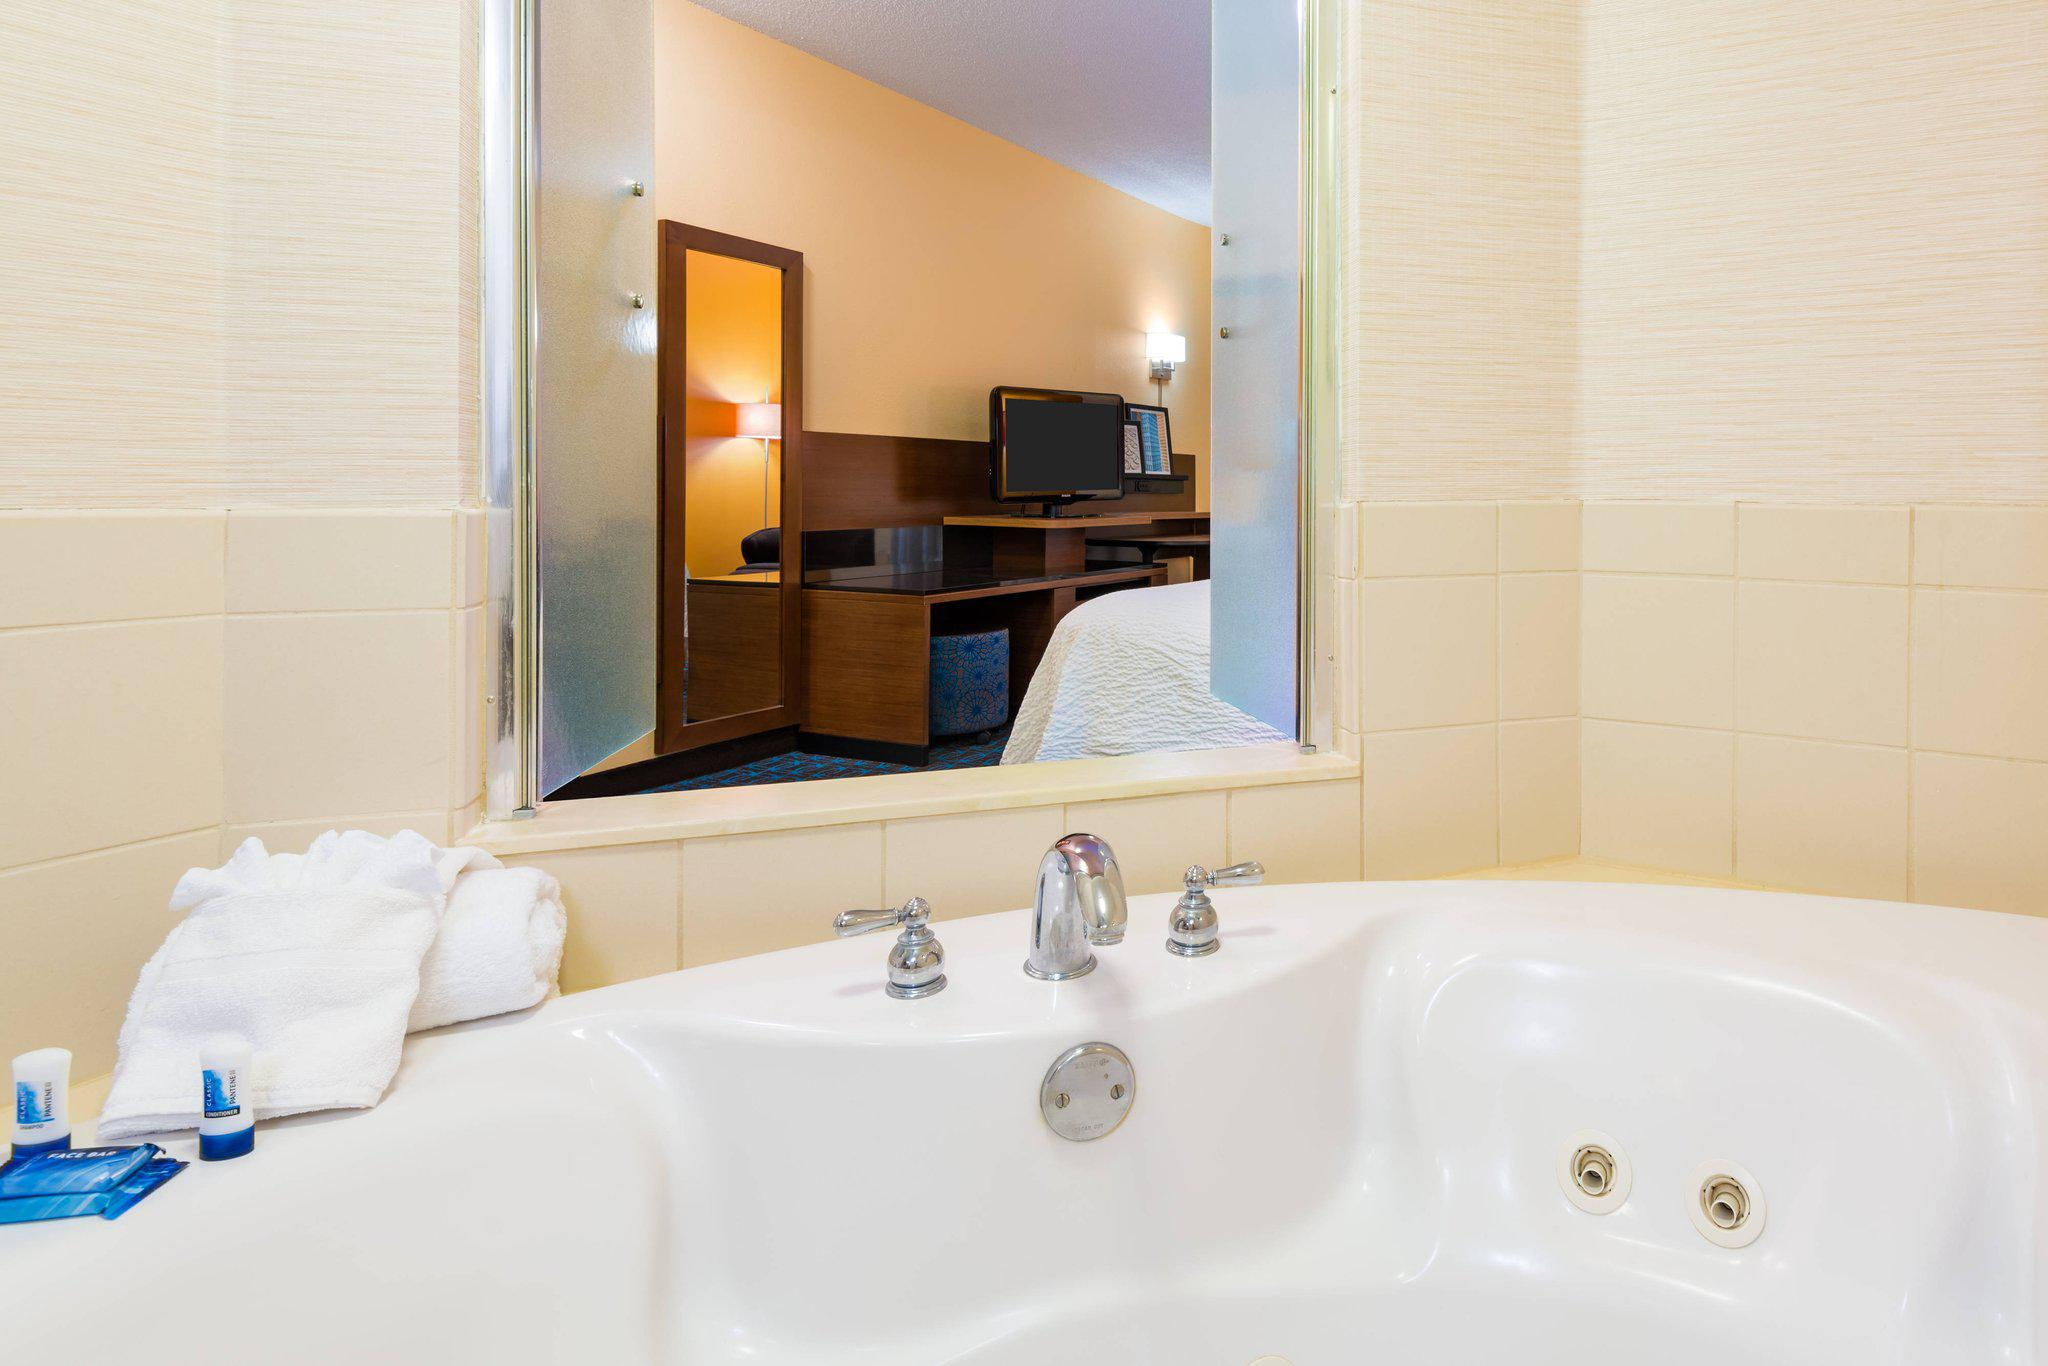 Fairfield Inn & Suites by Marriott Clearwater in Clearwater, FL, photo #15